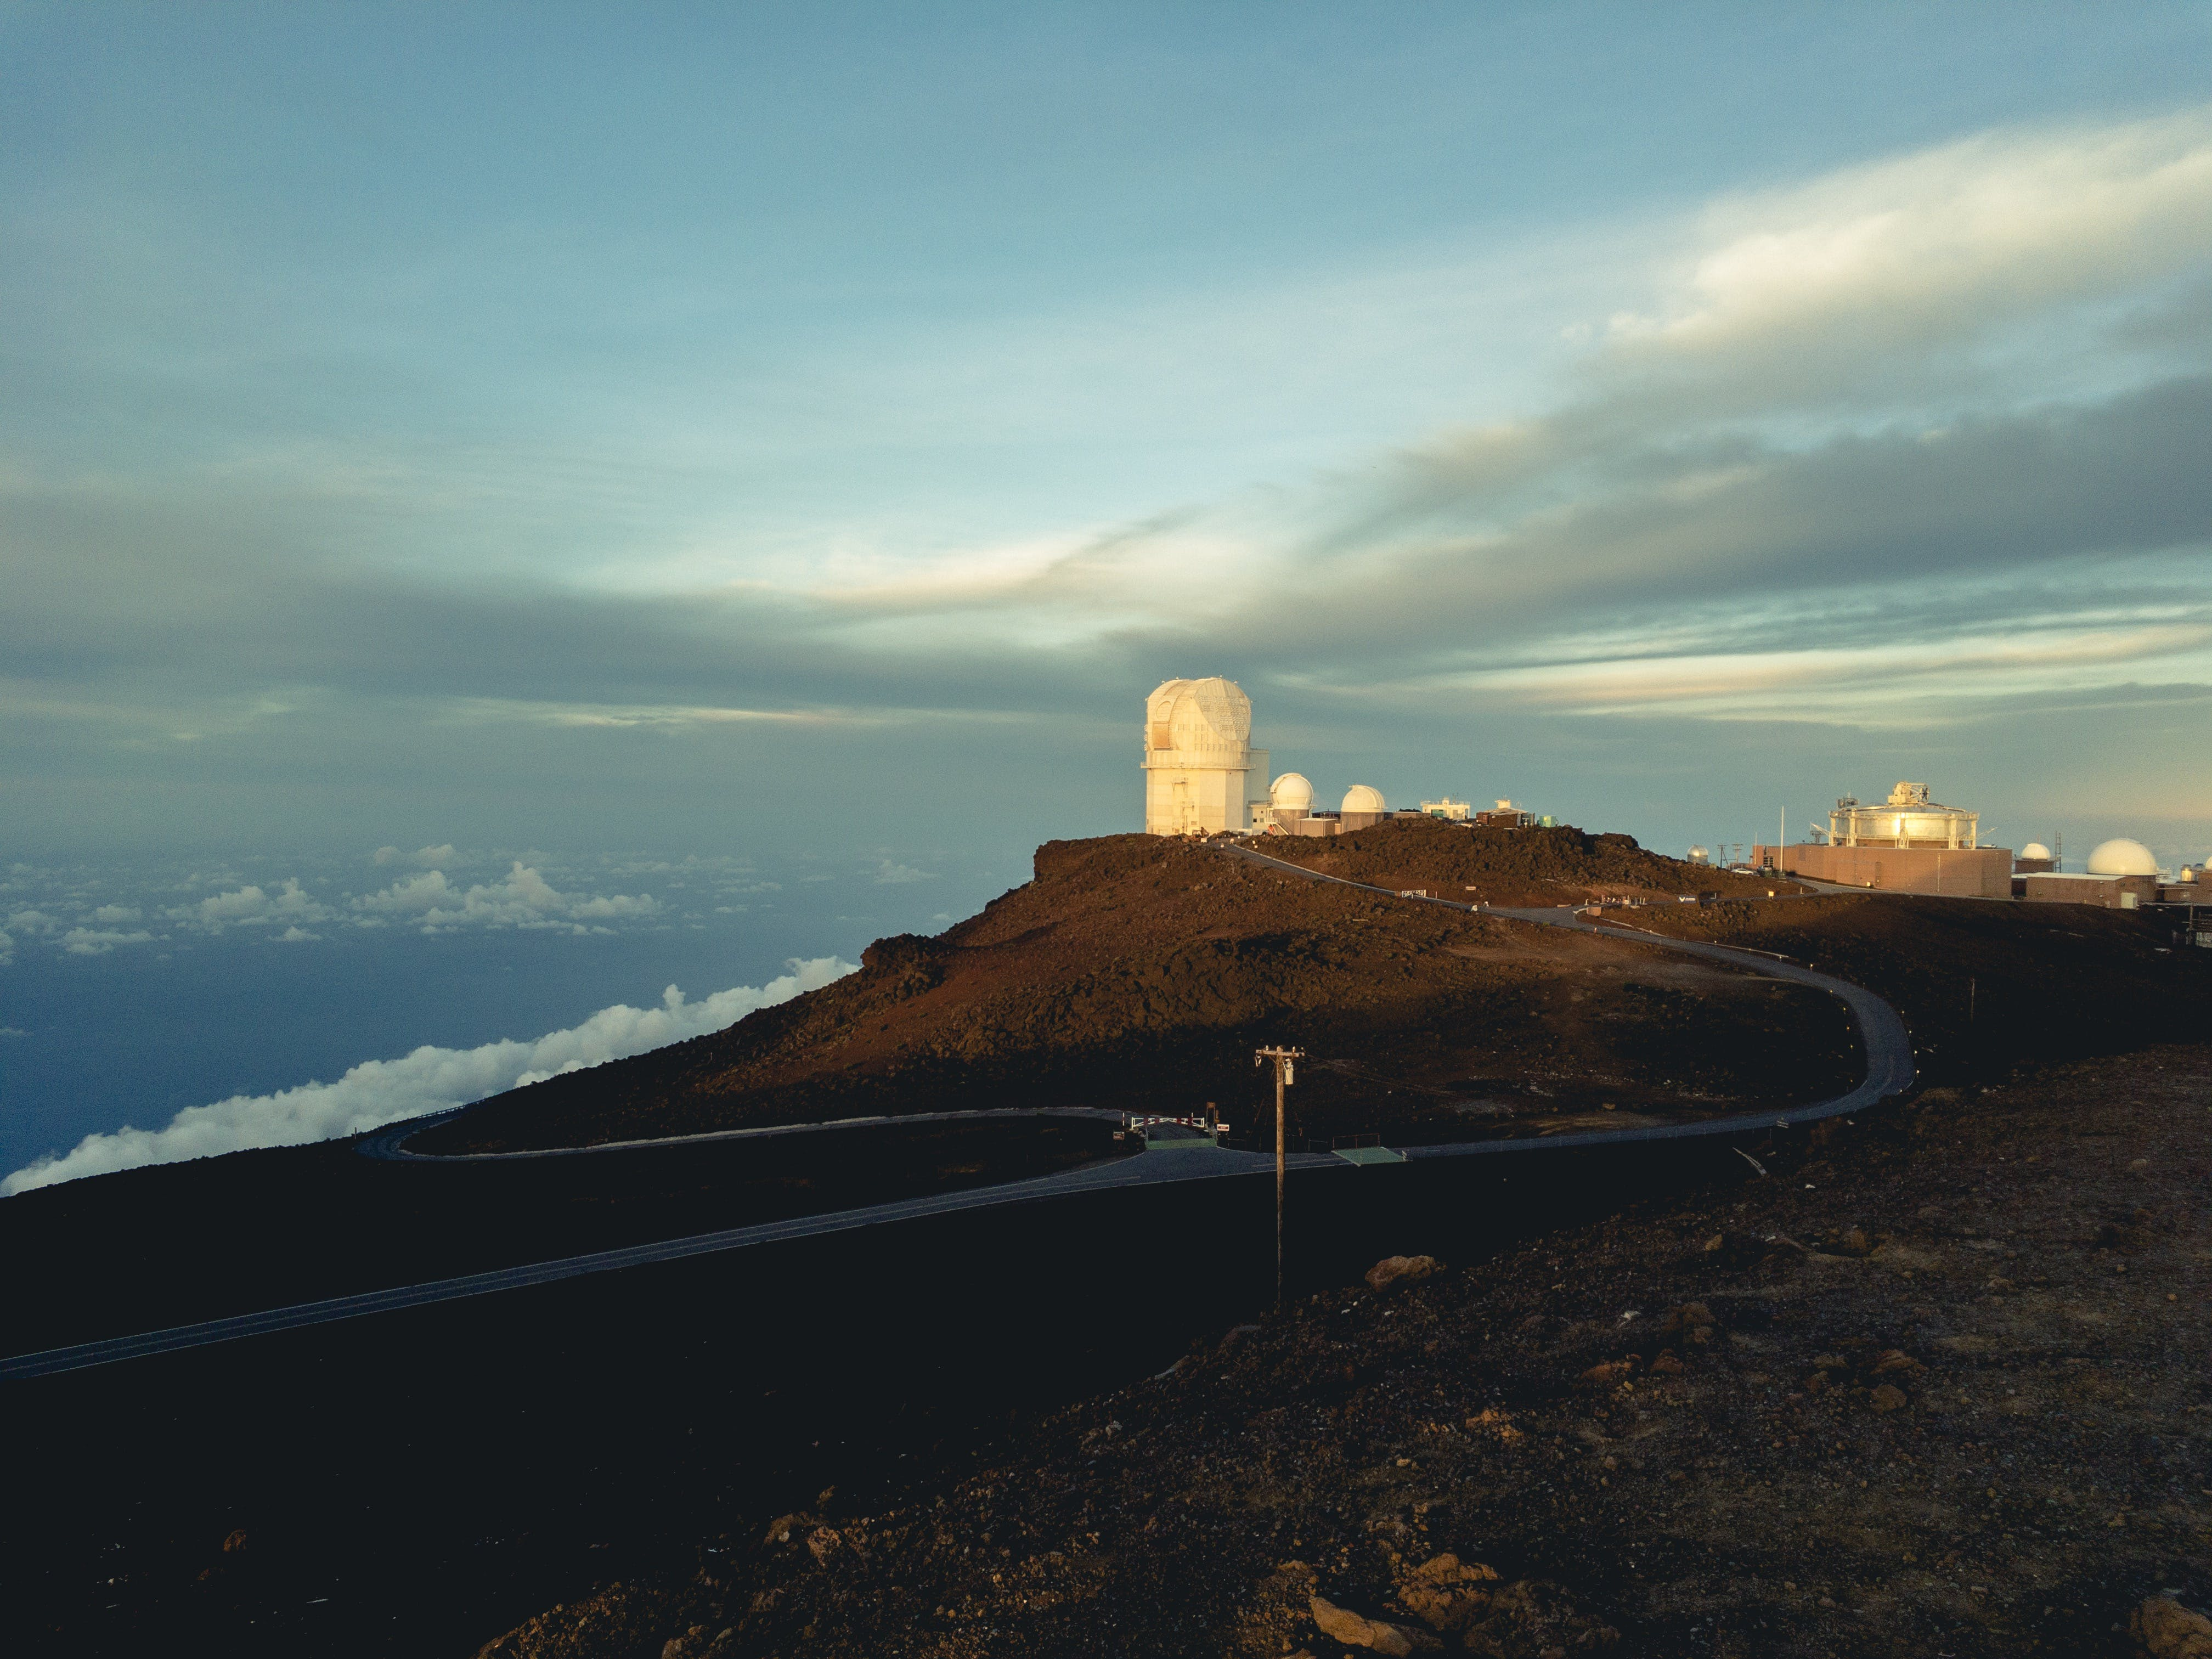 Free stock photo of high elevation, morning, observatory, sunrise